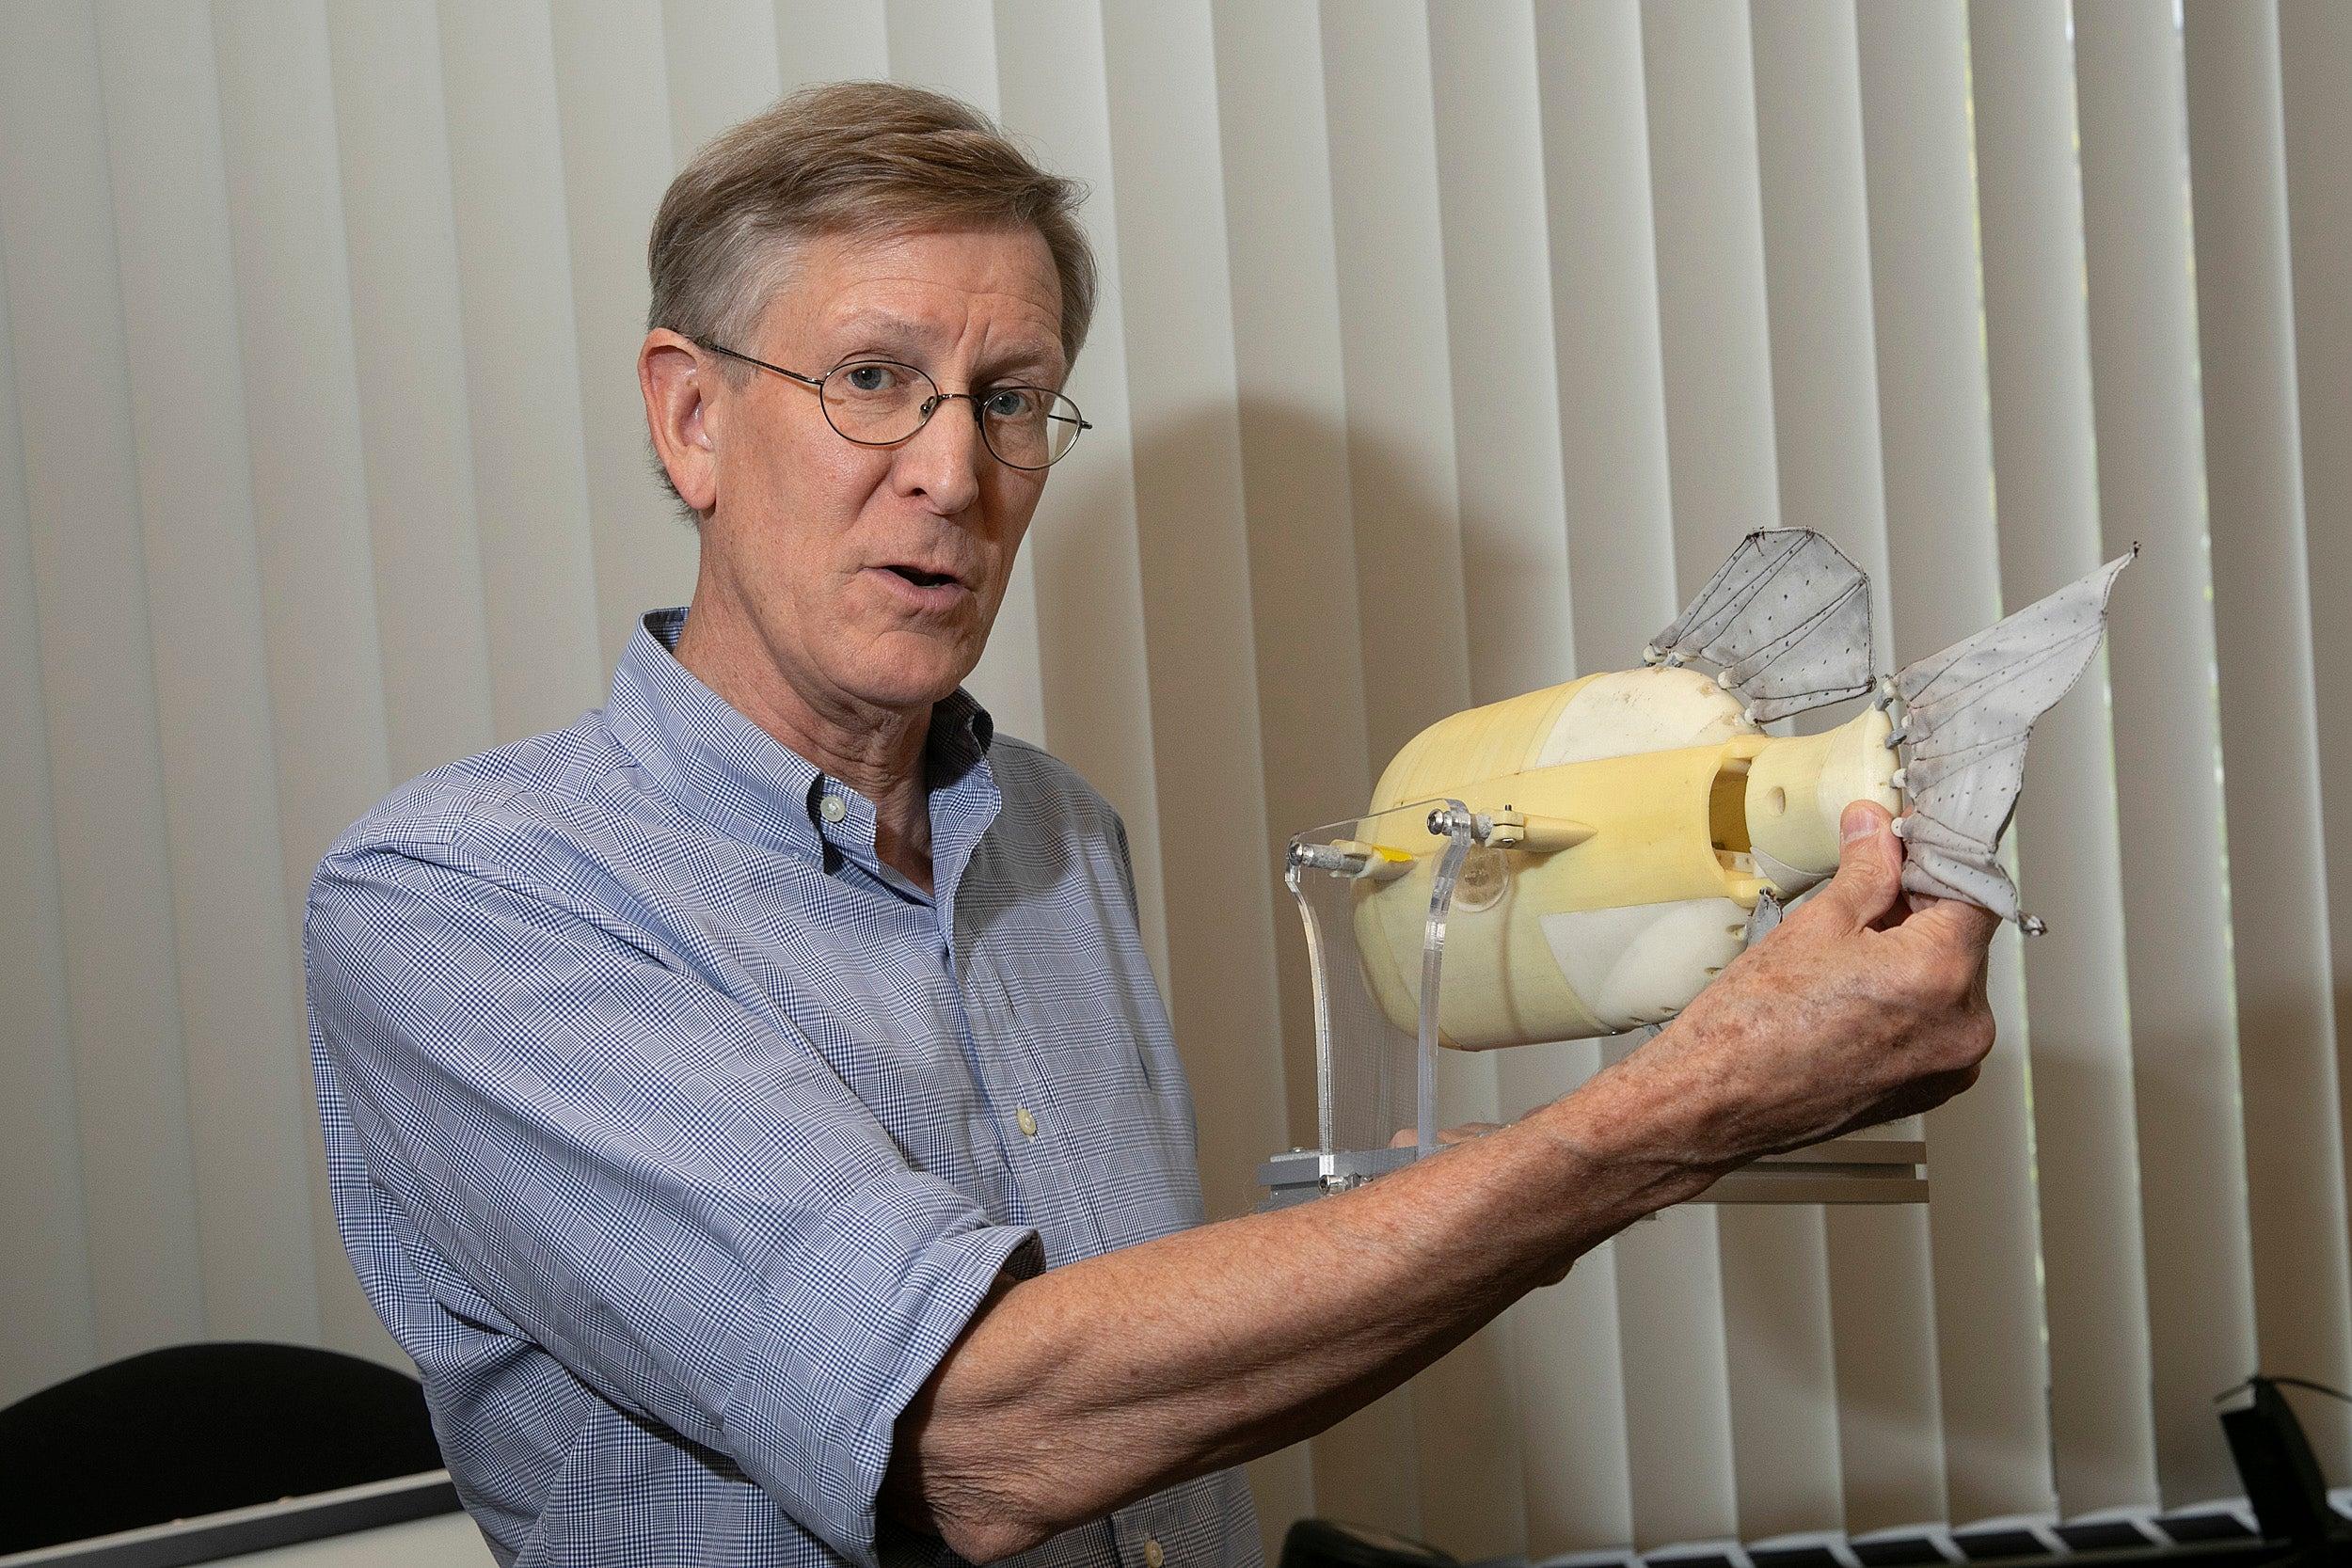 George Lauder holding a robotic fish